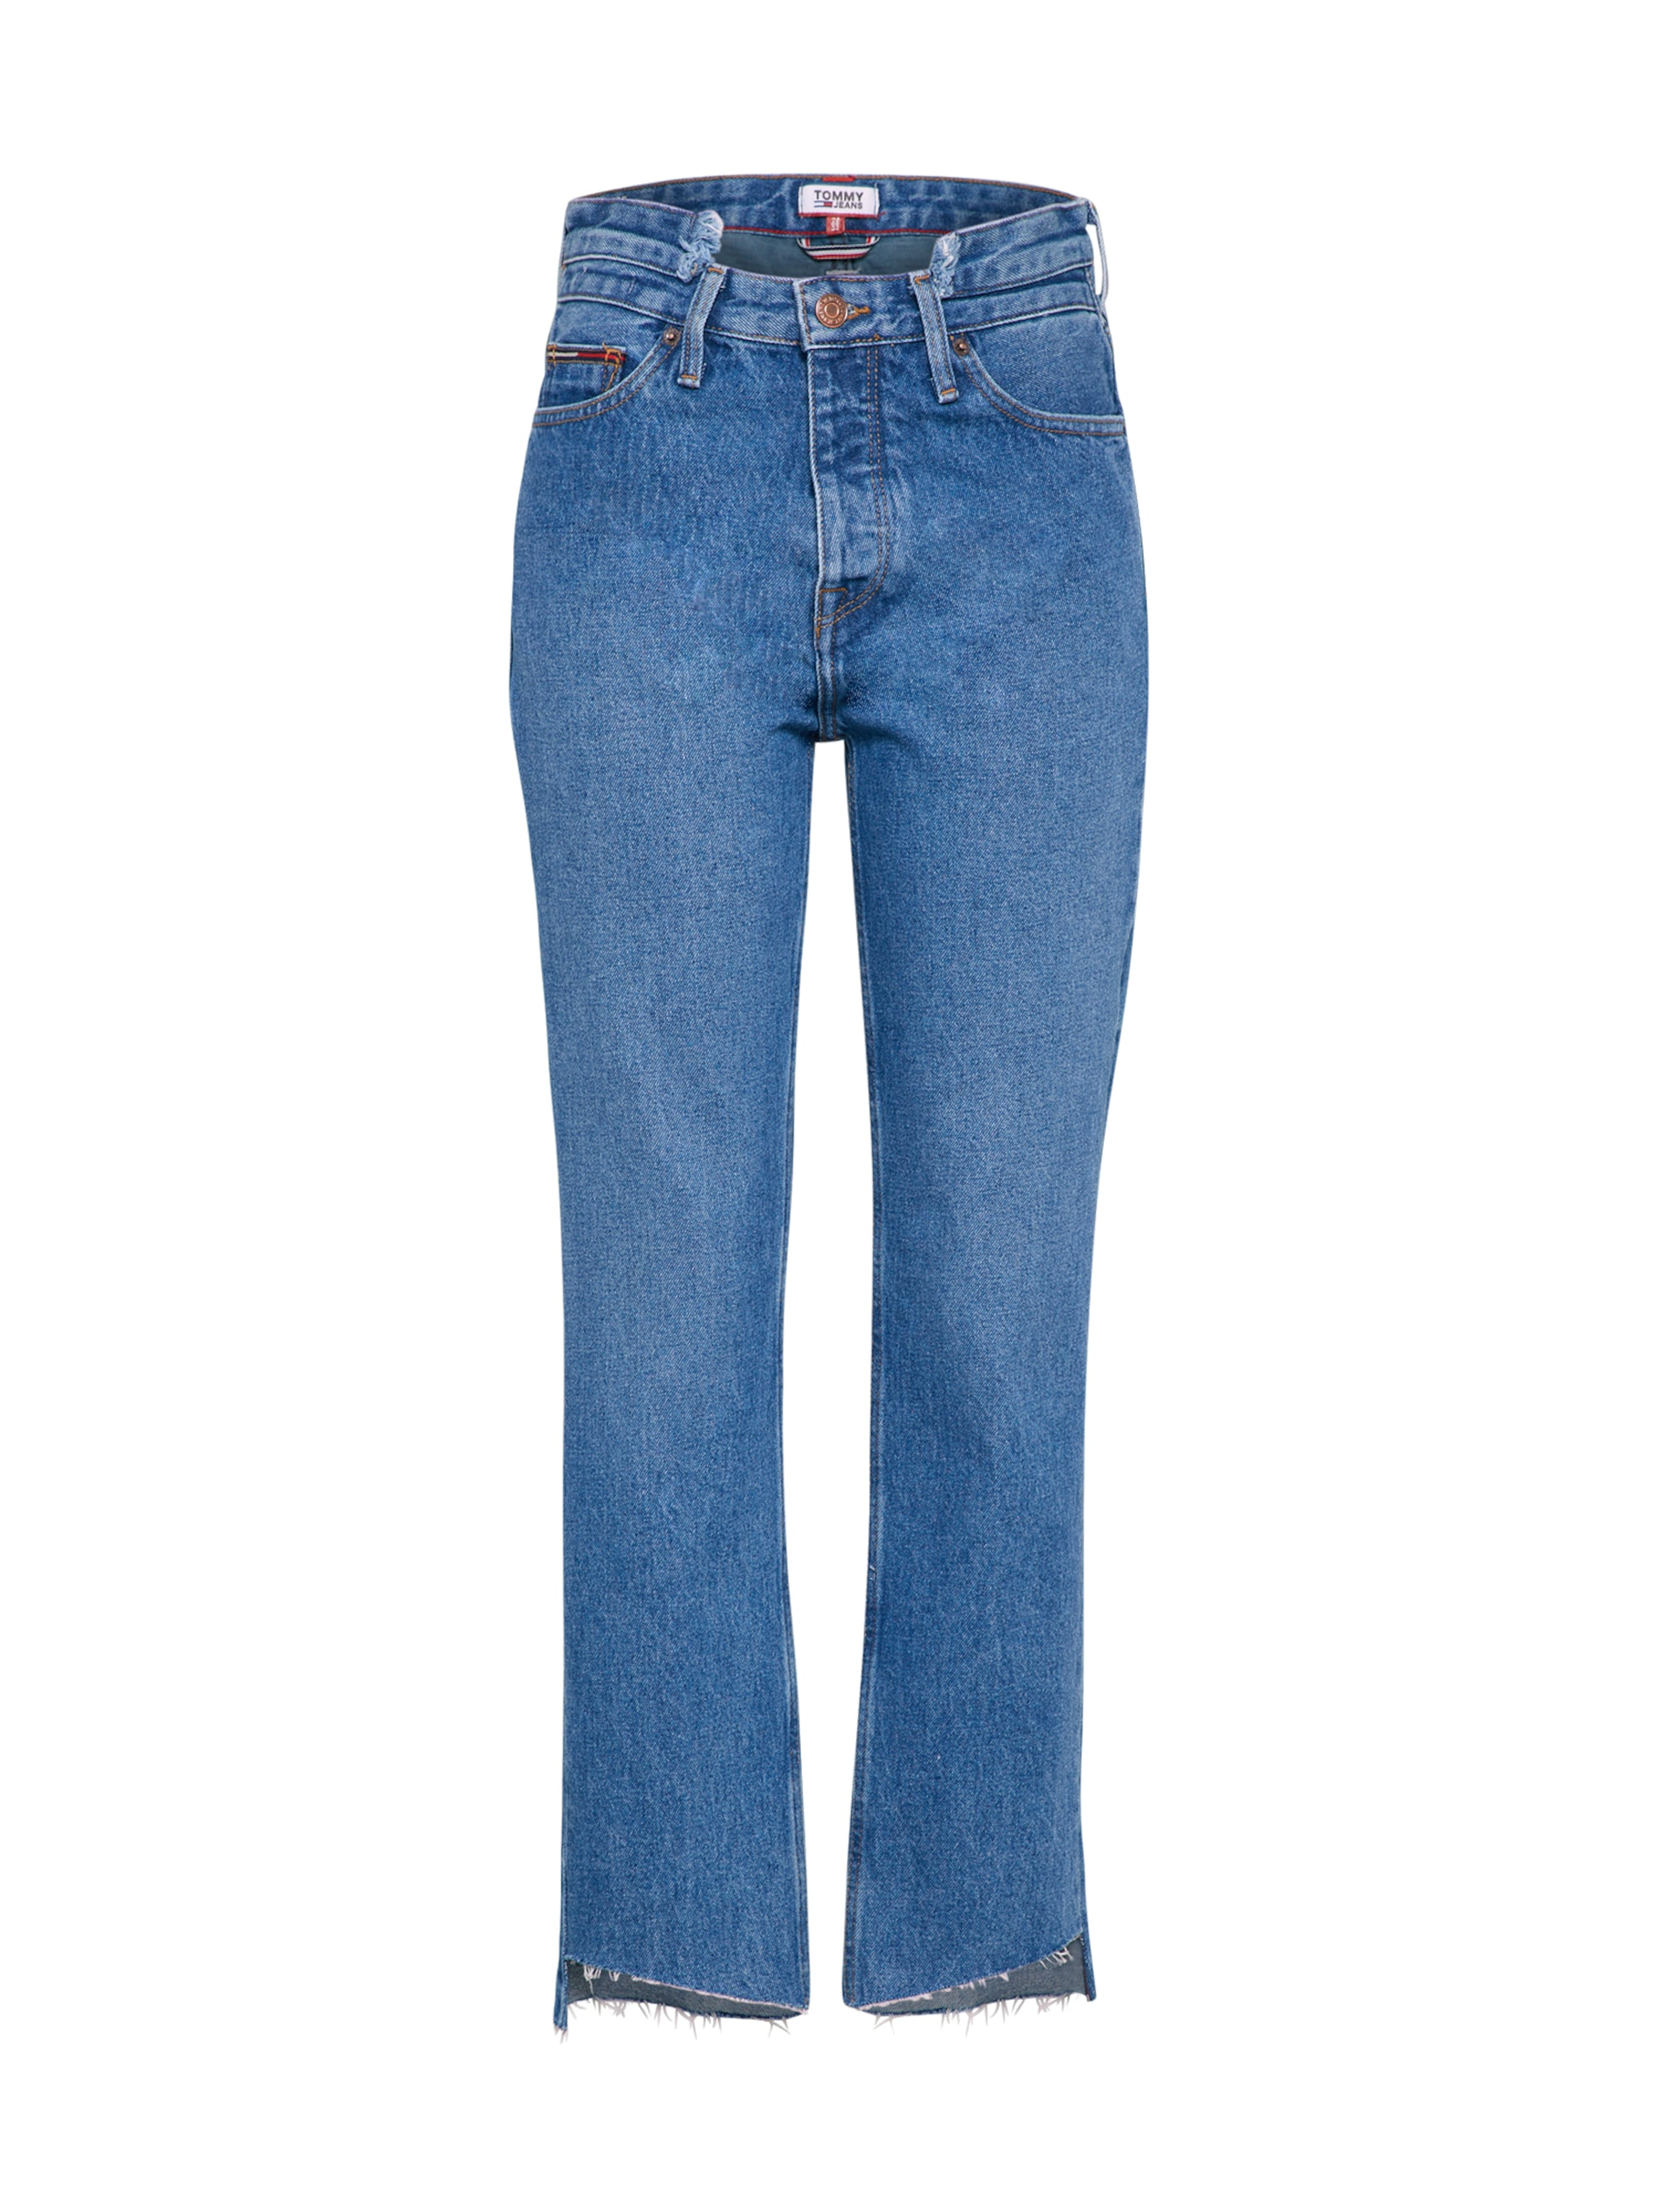 'high Tommy Denim Jeans Slimfit Slim Izzy' In Rise Blue dCrxtshQ